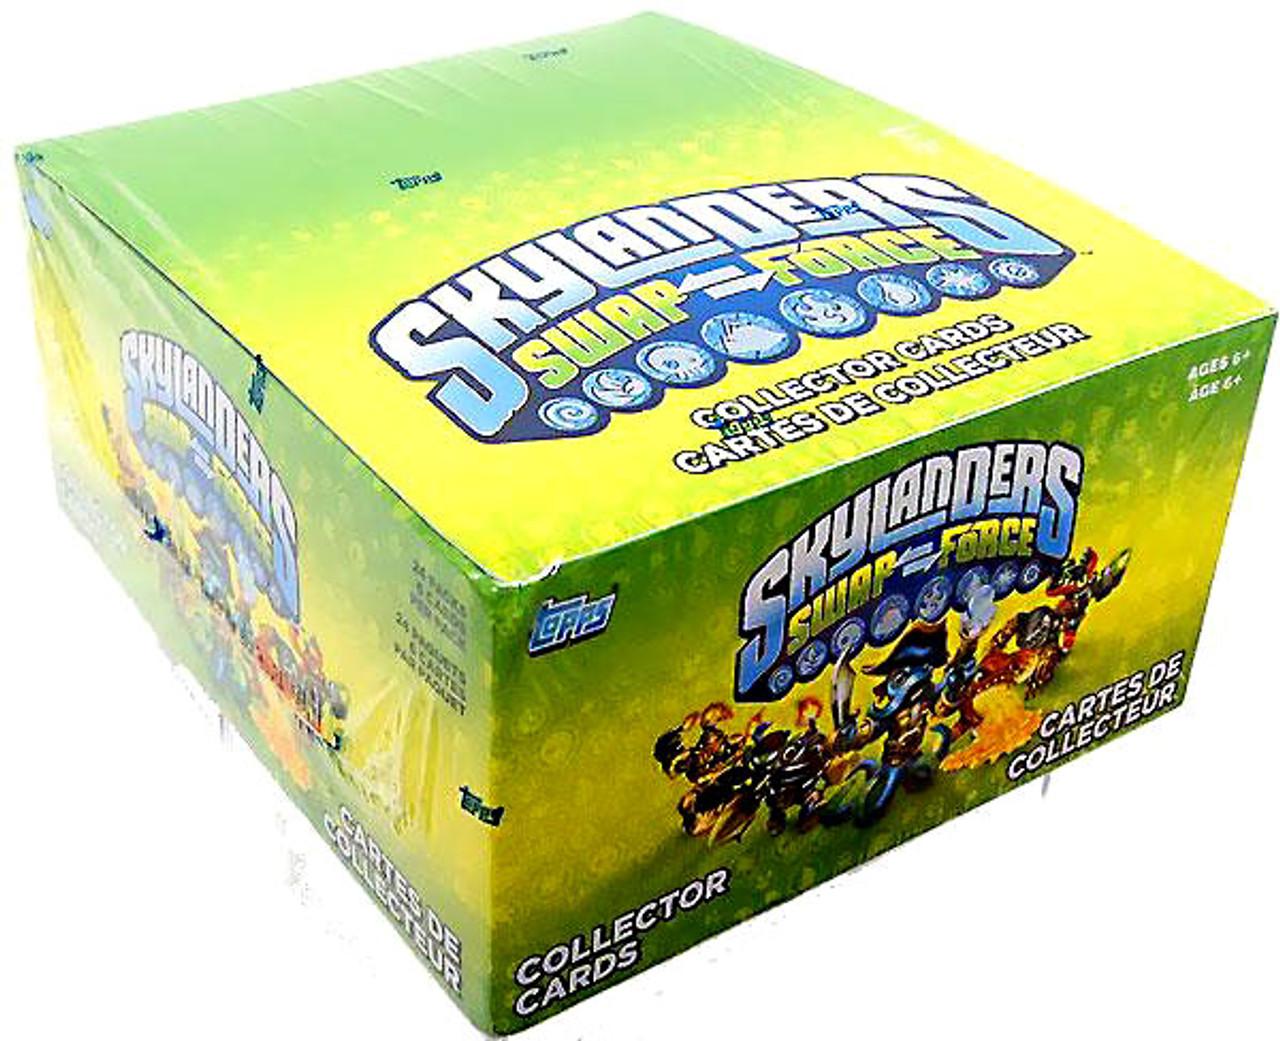 Skylanders Swap Force Trading Card Box